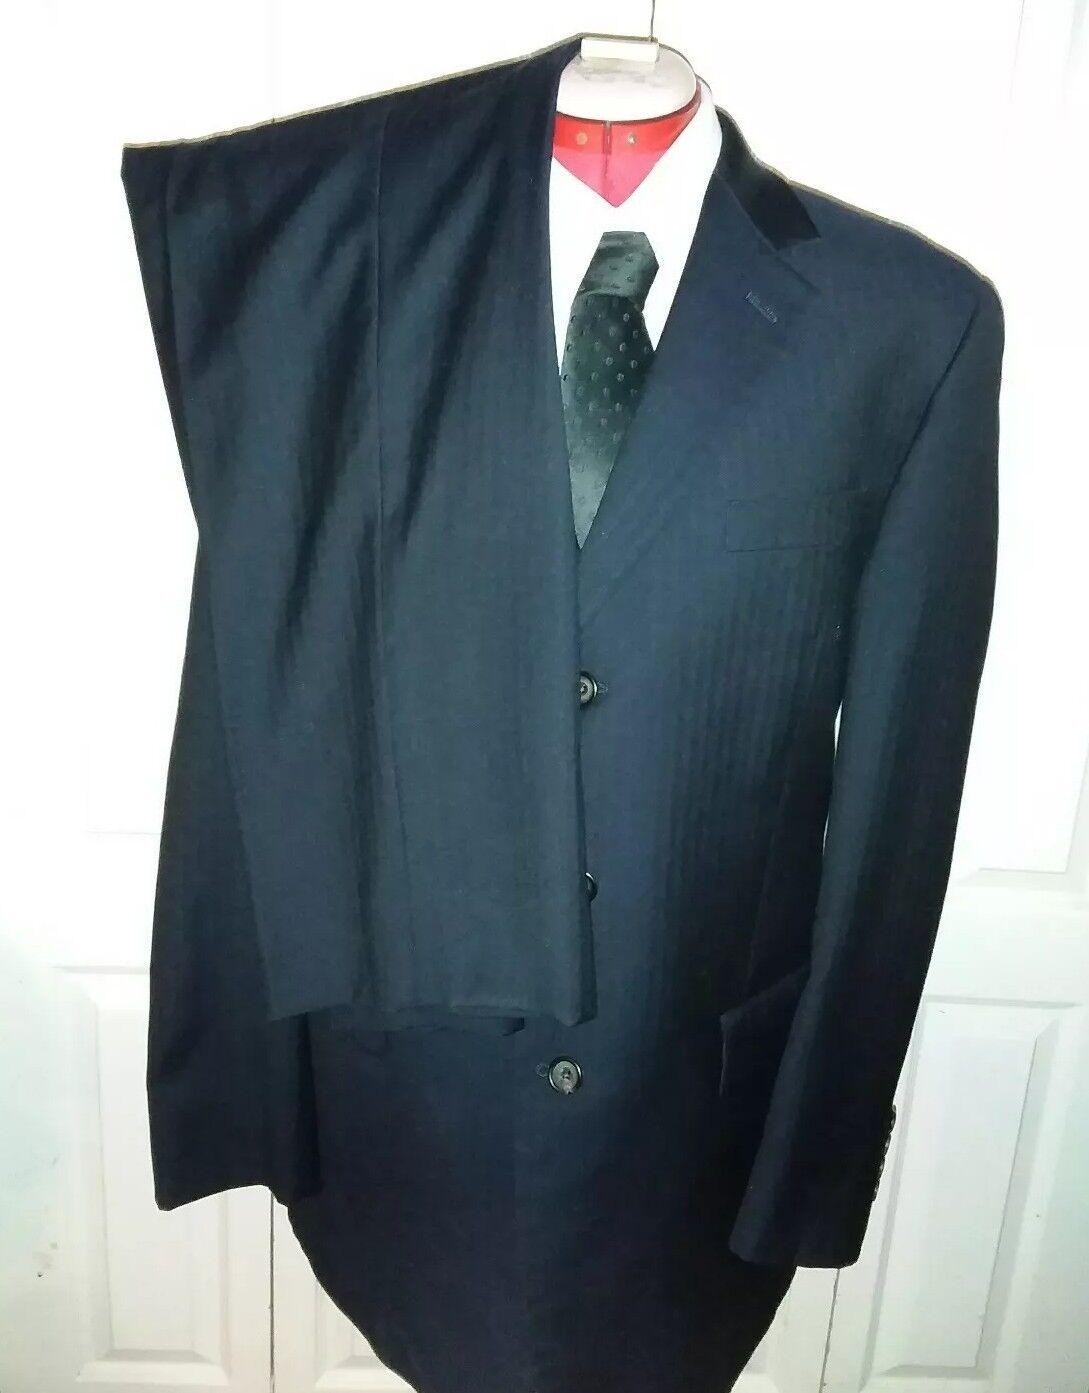 Ralph Lauren Green Label 3 Button Navy bluee Stripe Wool 2 Piece Suit 42R 38 30